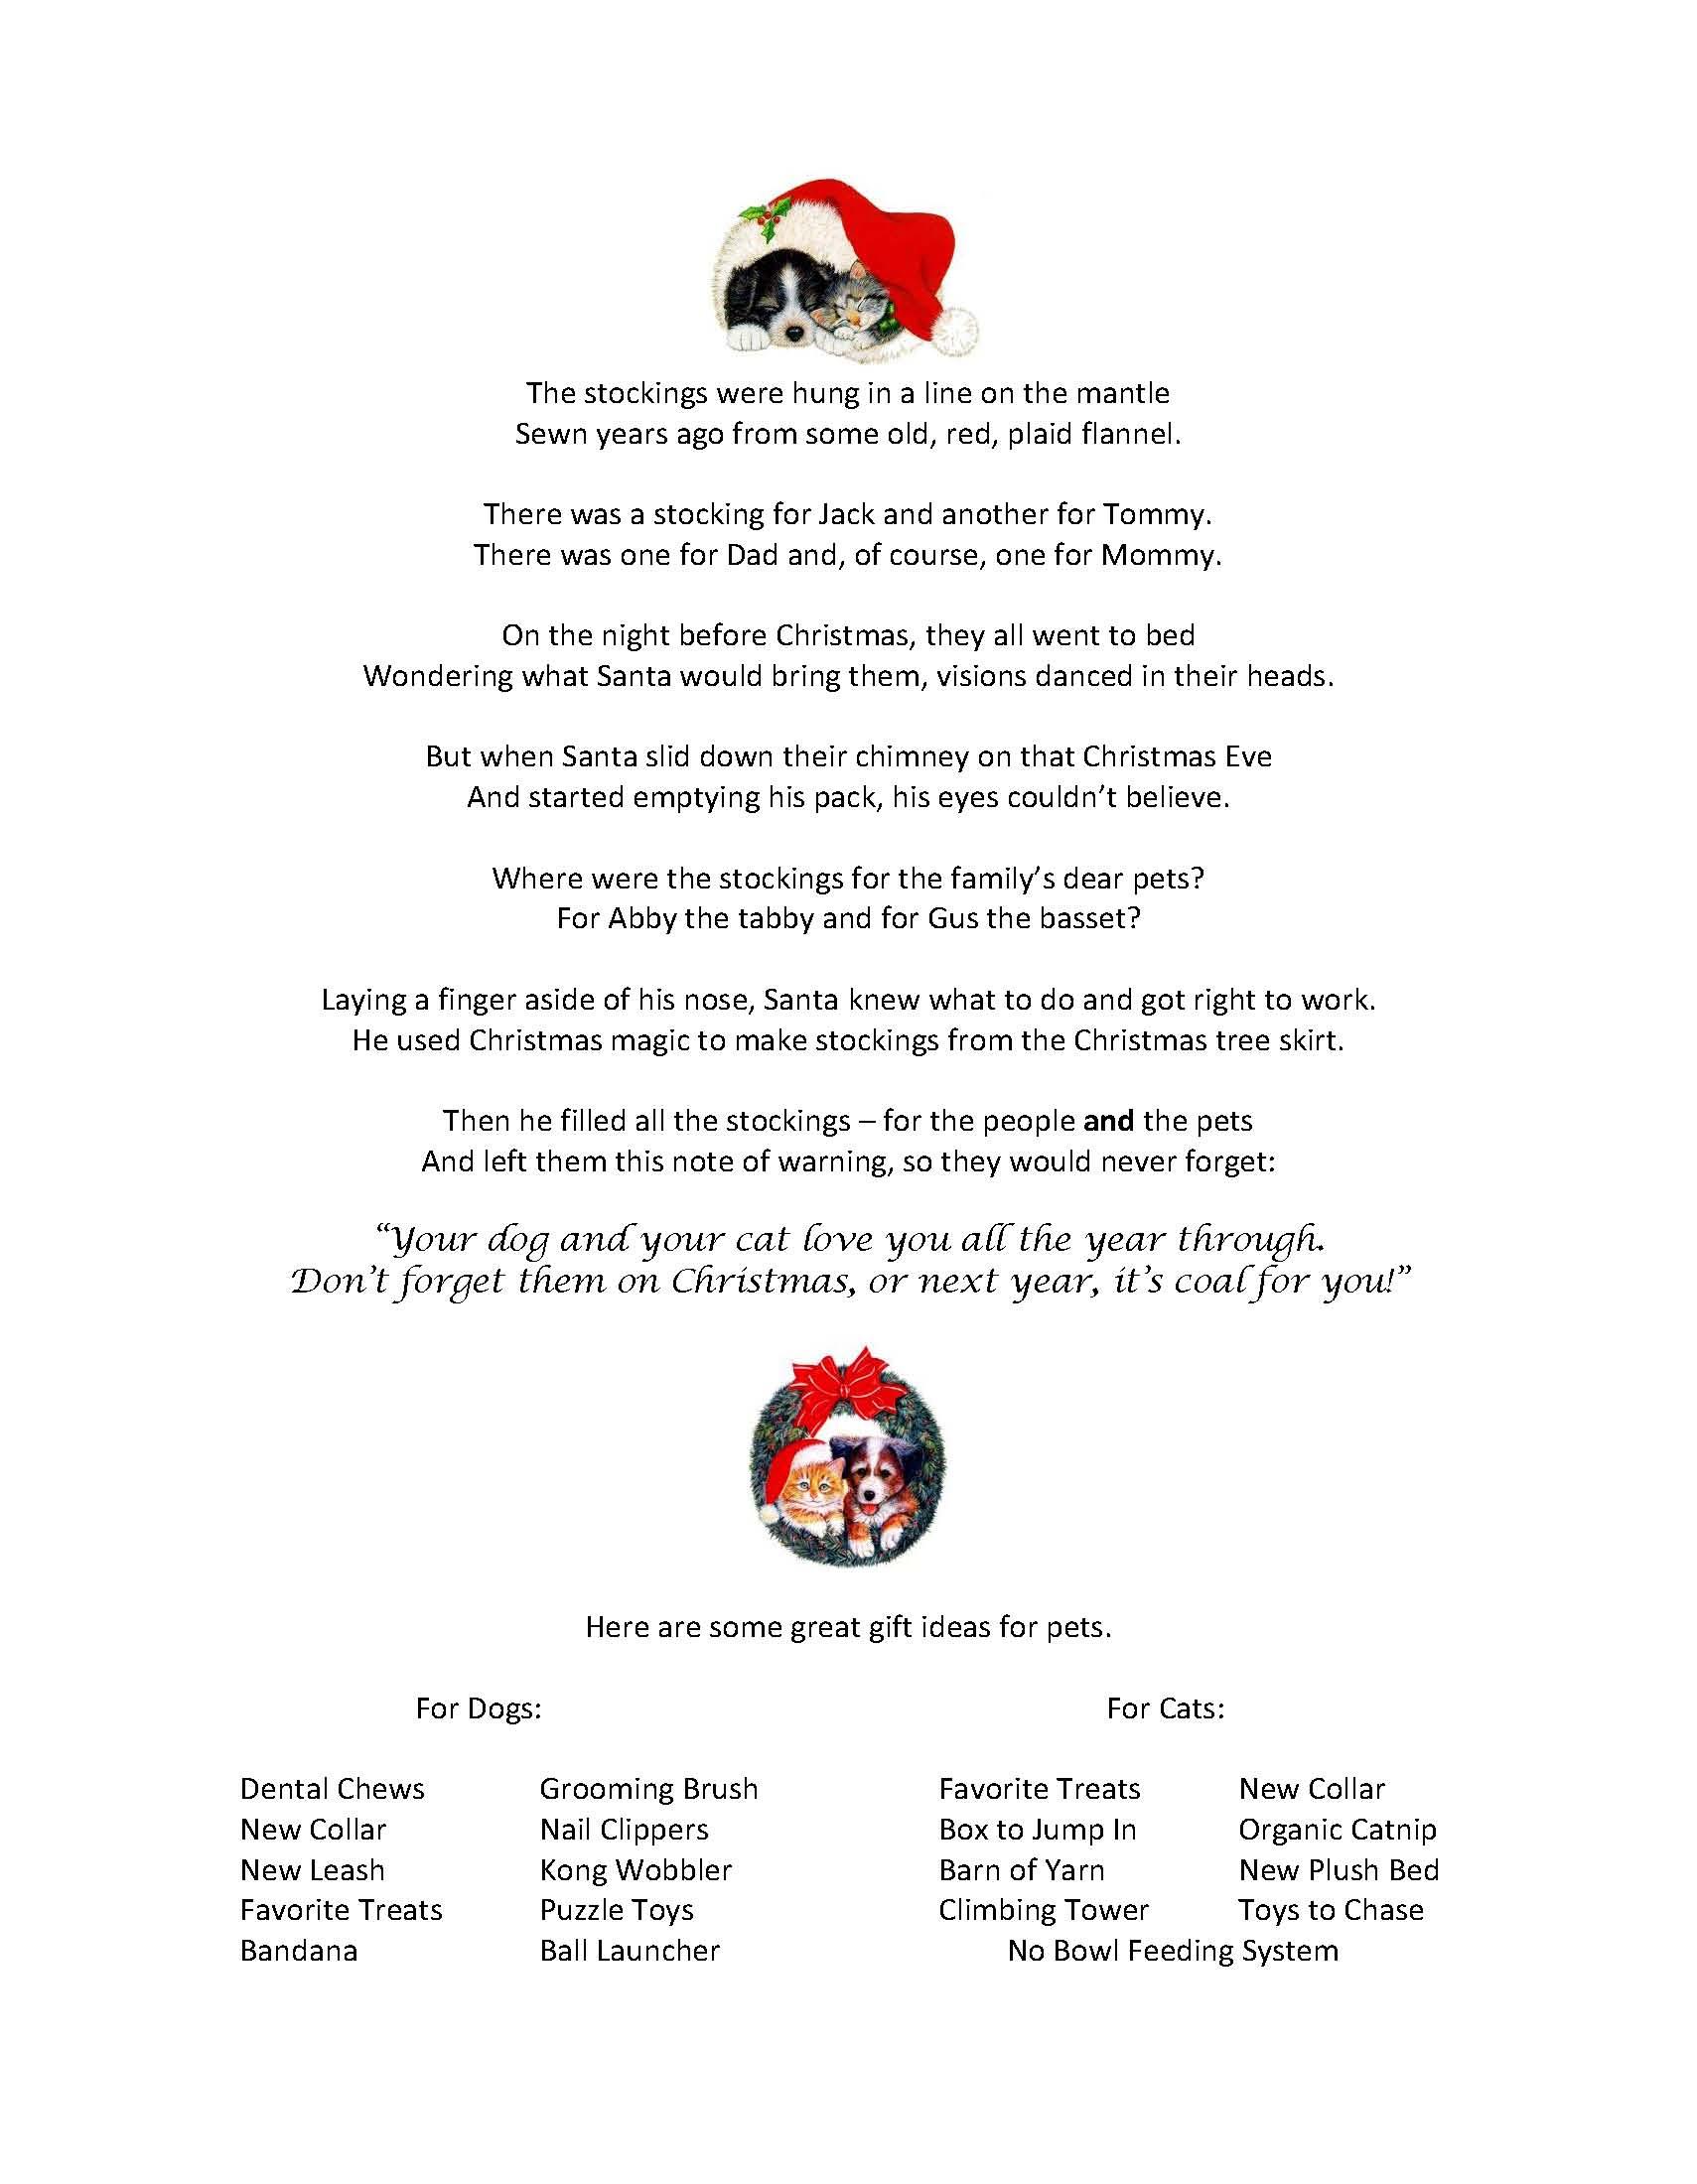 christmas-stockings-poem-gift-ideas-for-petspdf.jpg